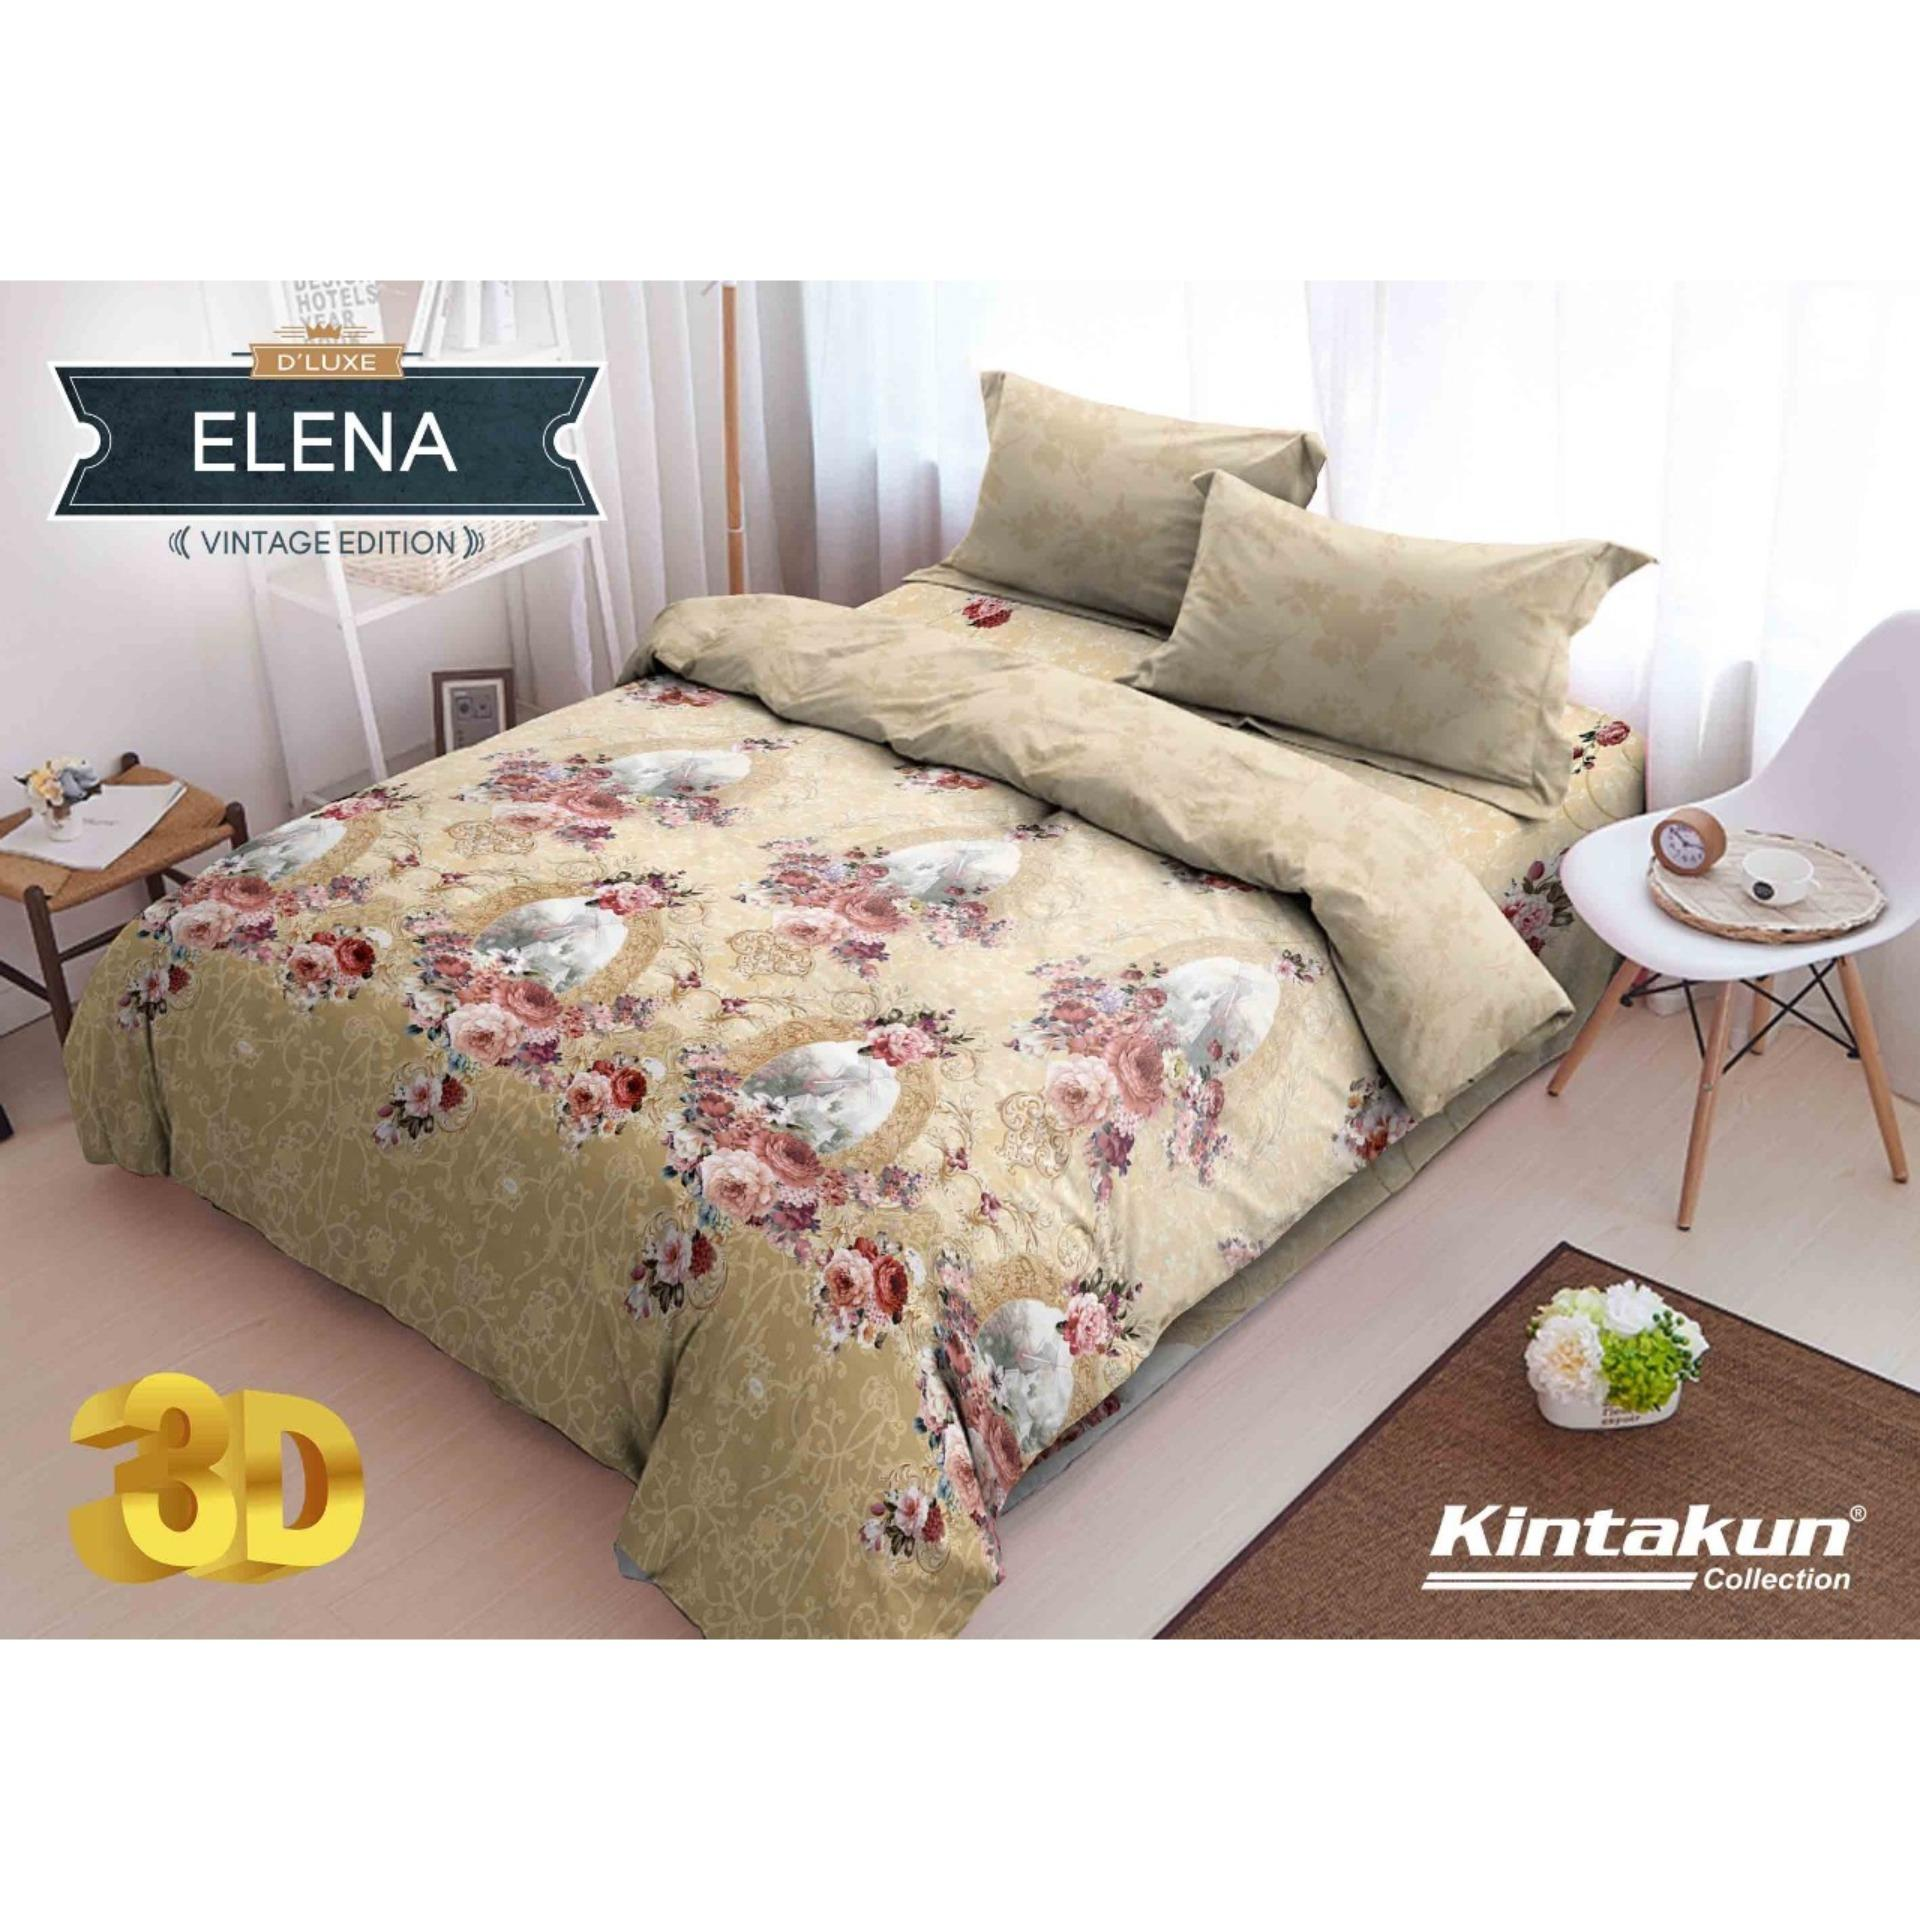 RainbowSale - Sprei Flat Queen Kintakun 3D Deluxe / Dluxe Motif Elena